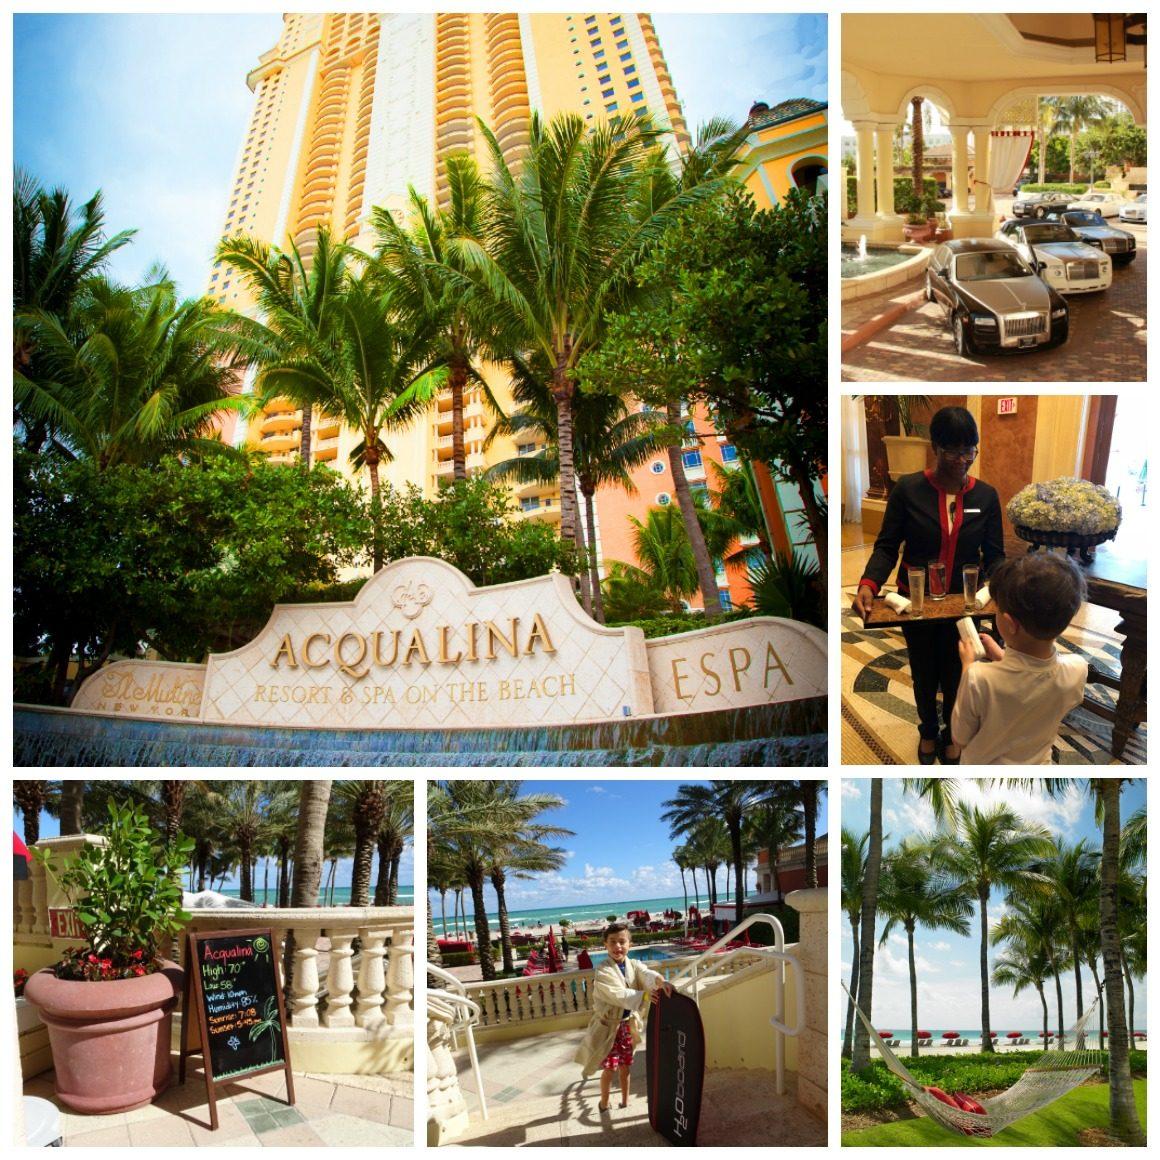 Luxury Family Beach Holiday at Acqualina Resort & Spa Miami Beach